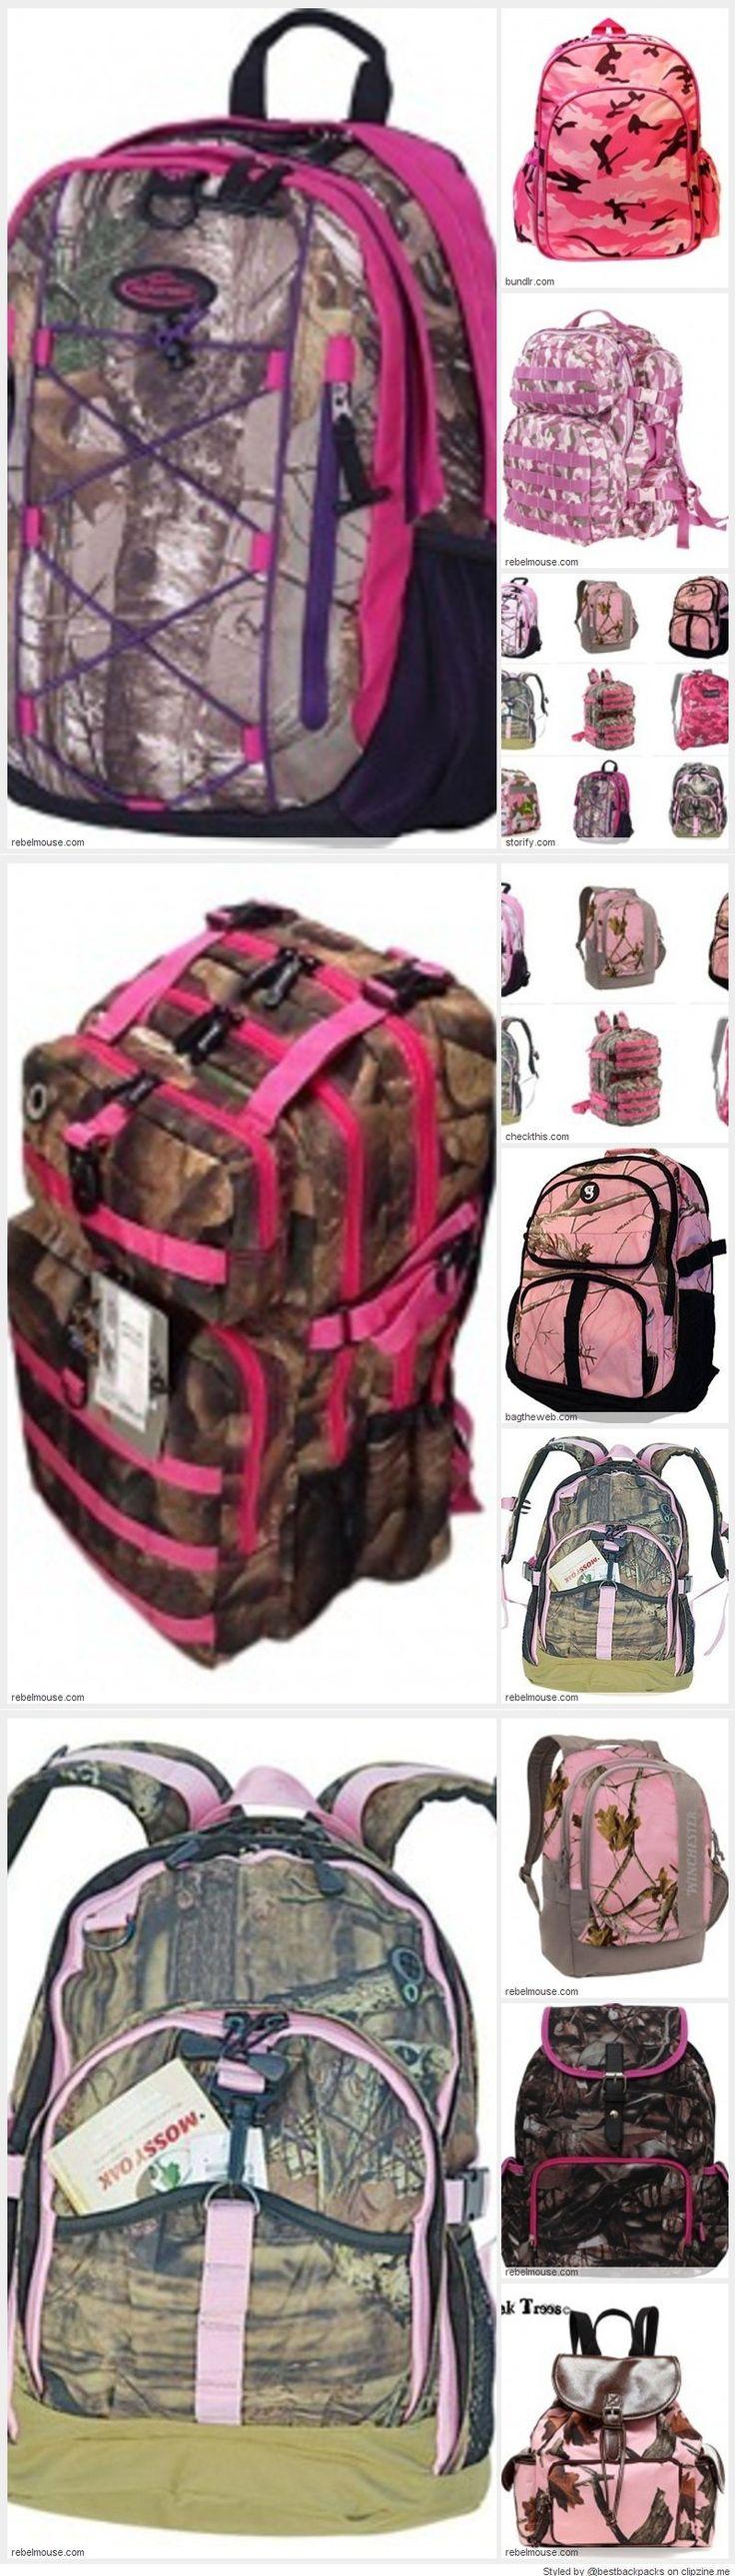 Best Pink Camo Backpacks for School